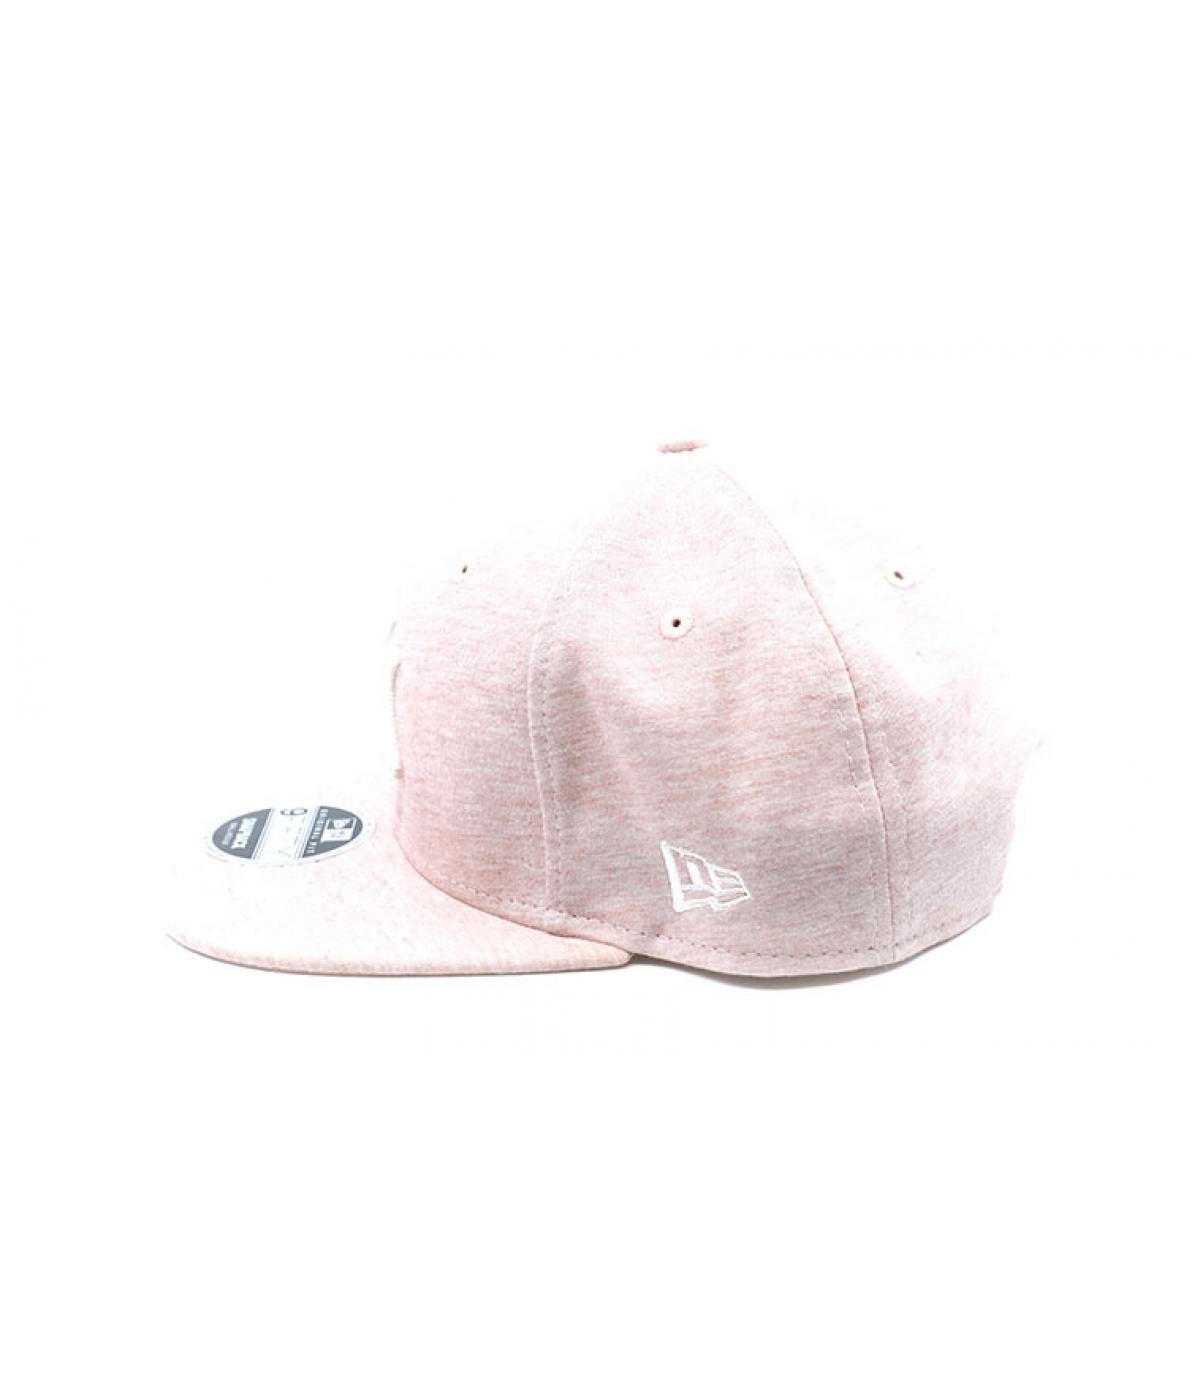 Détails Snapback Jersey Brights 9Fifty NY pink - image 4